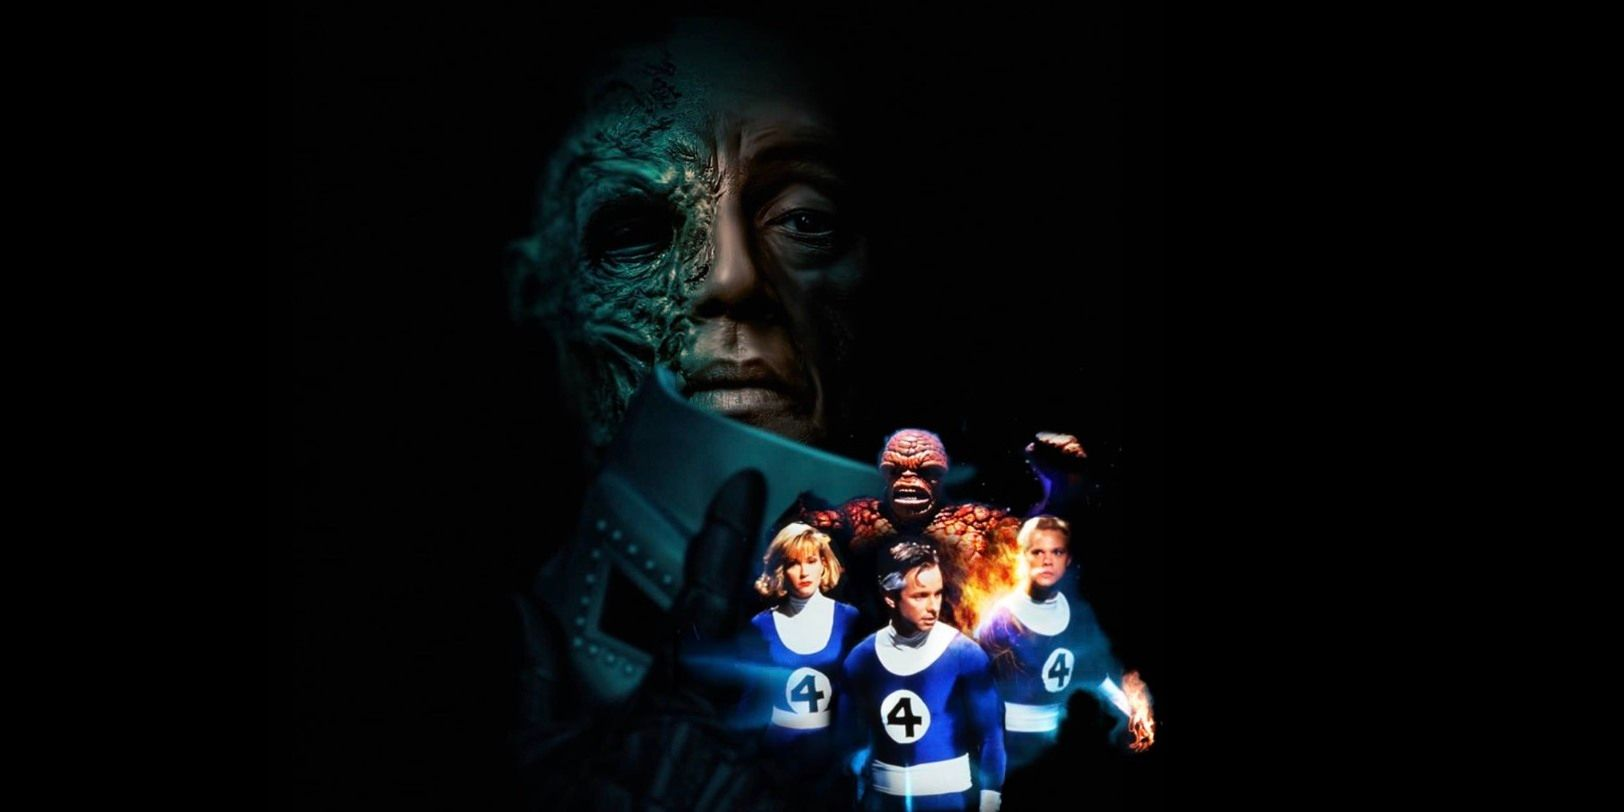 Fantastic Four Art Imagines Giancarlo Esposito as a Disfigured Doctor Doom